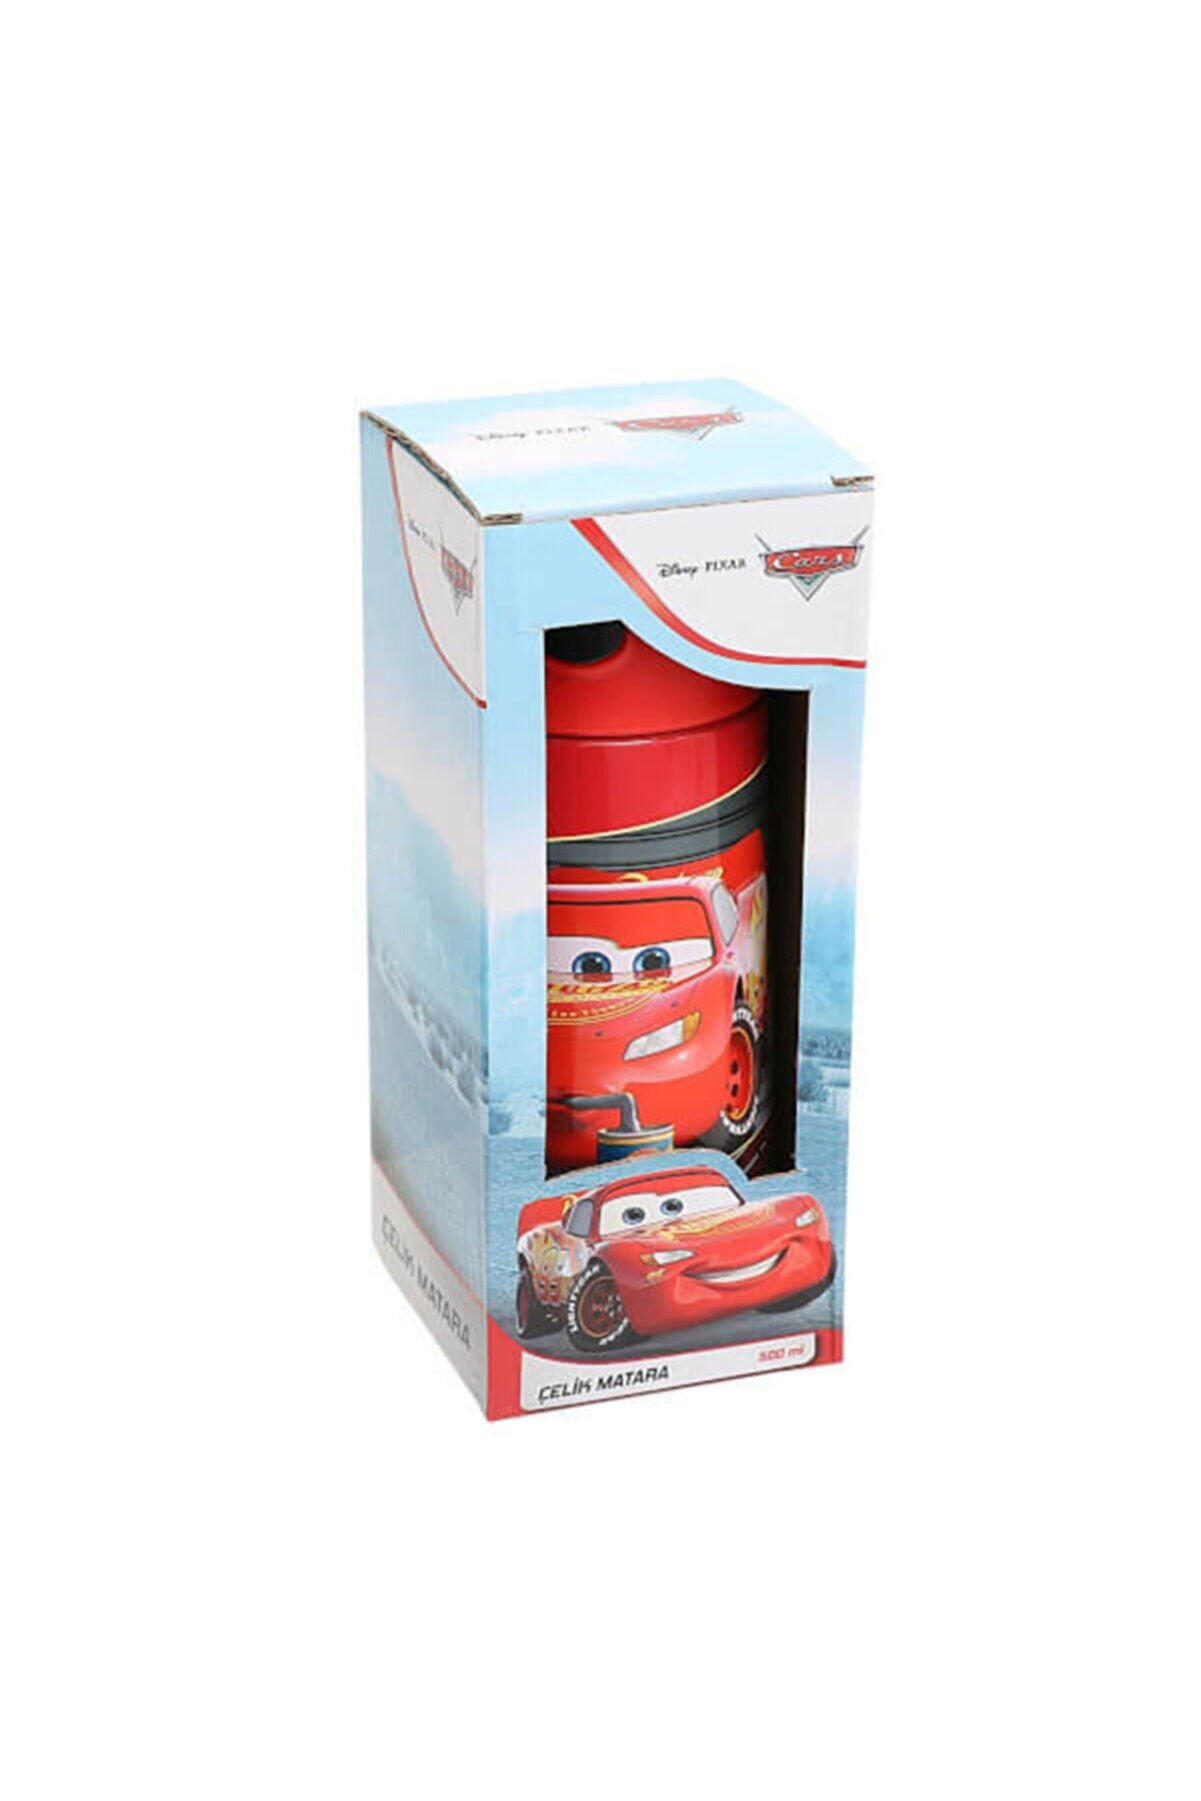 Şahin Lisanslı Cars Çelik Matara 500 ml 4402030